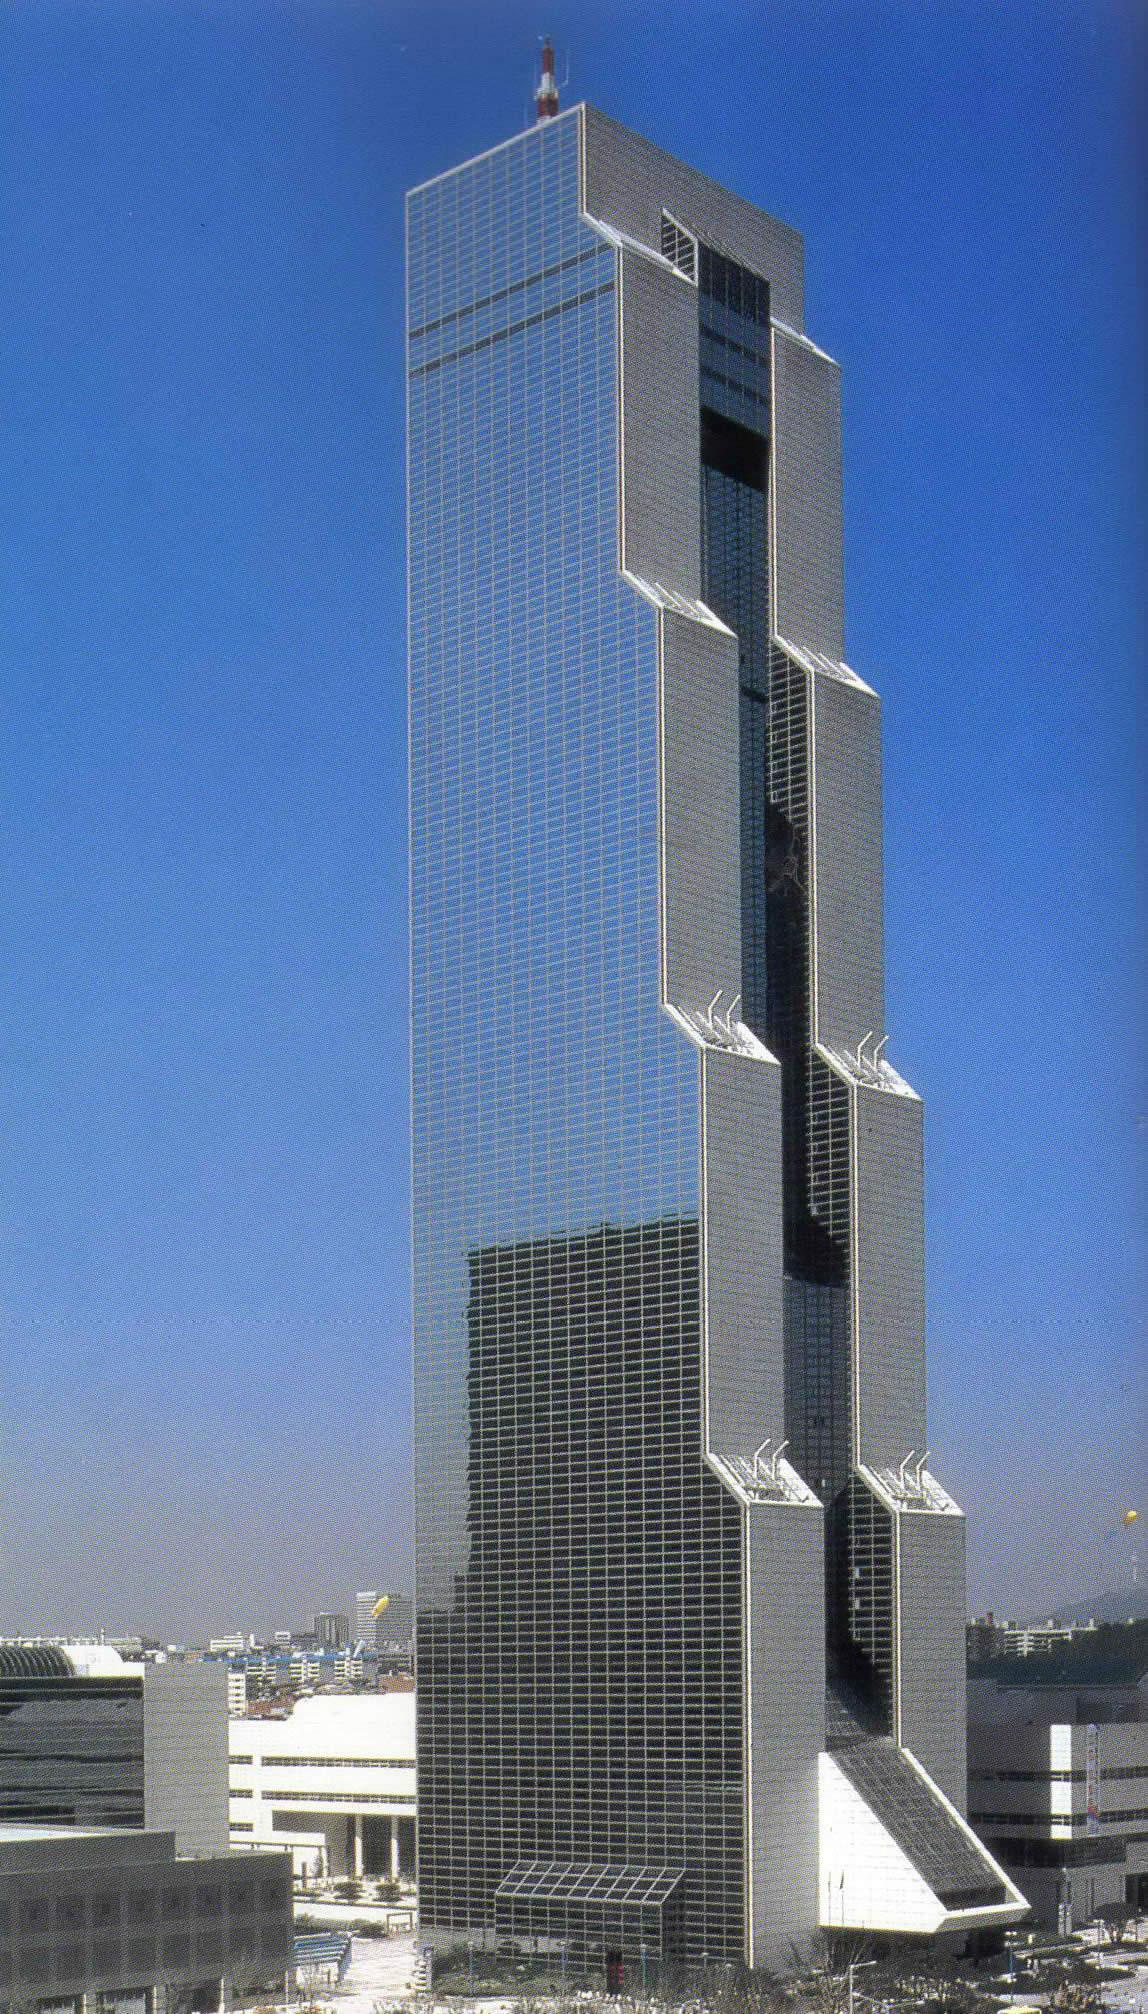 Korea World Trade Center